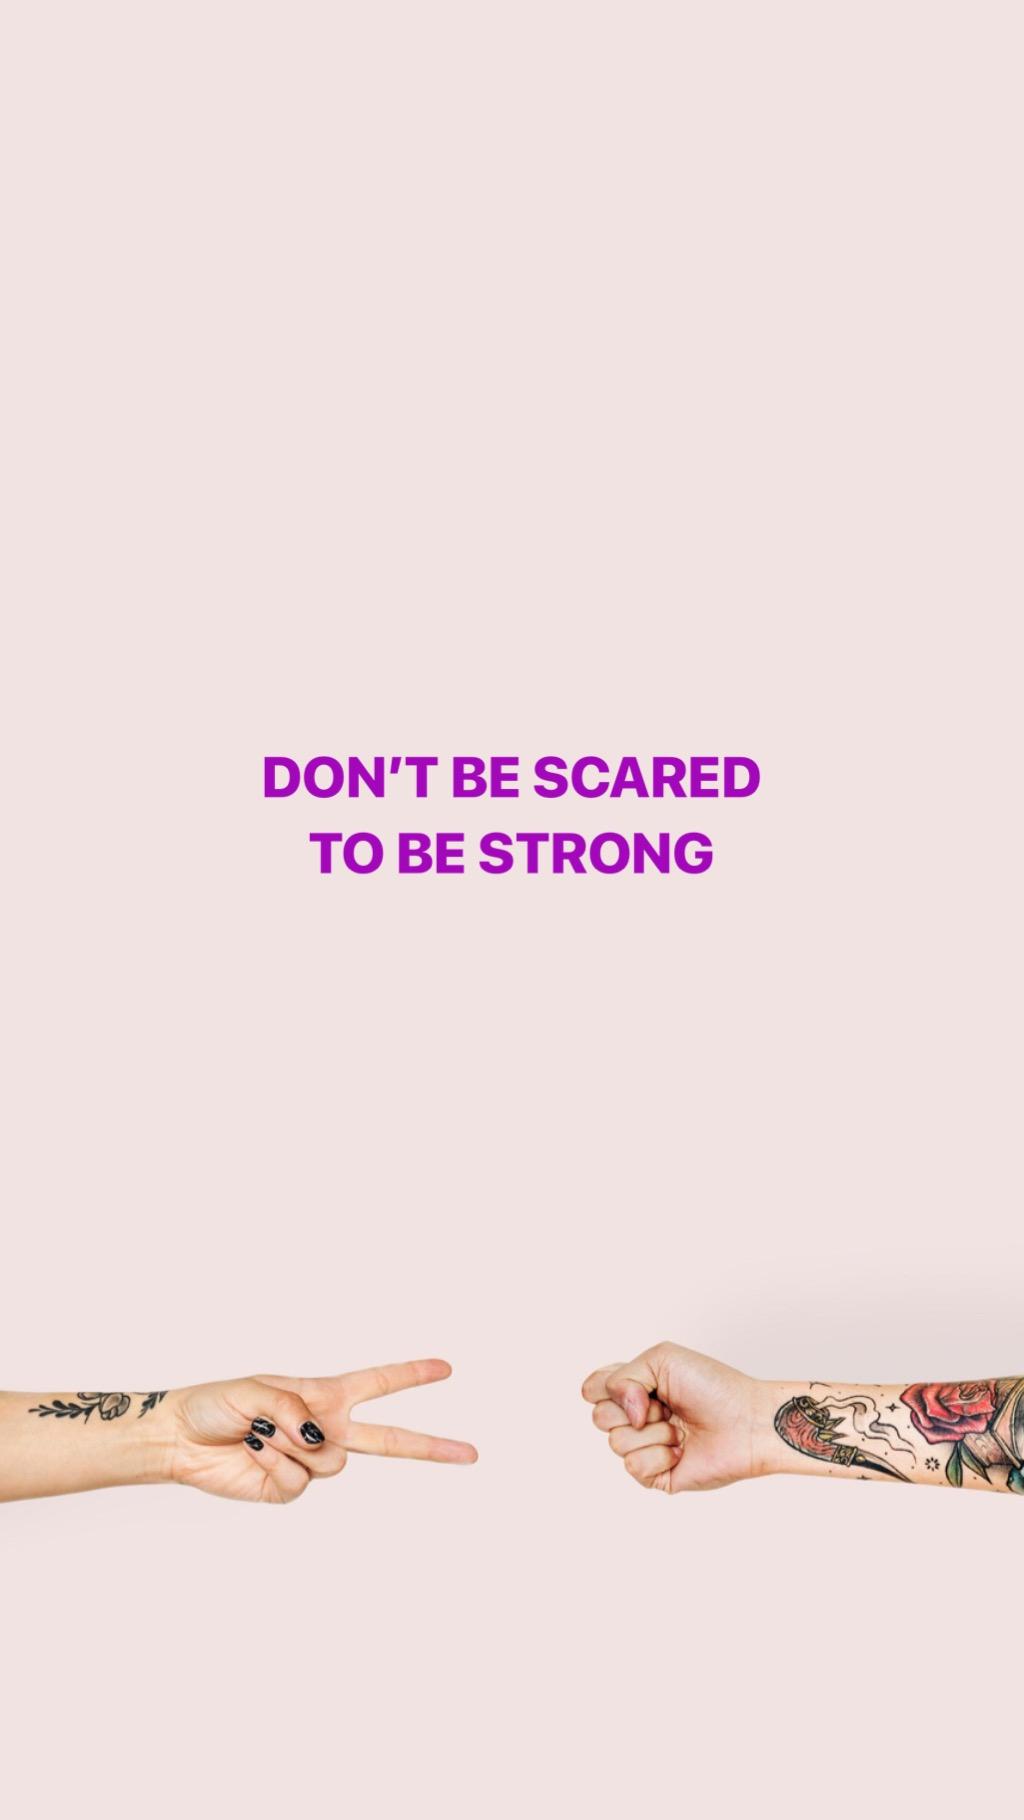 Alix de Bretagne - Don't be afraid to be strong